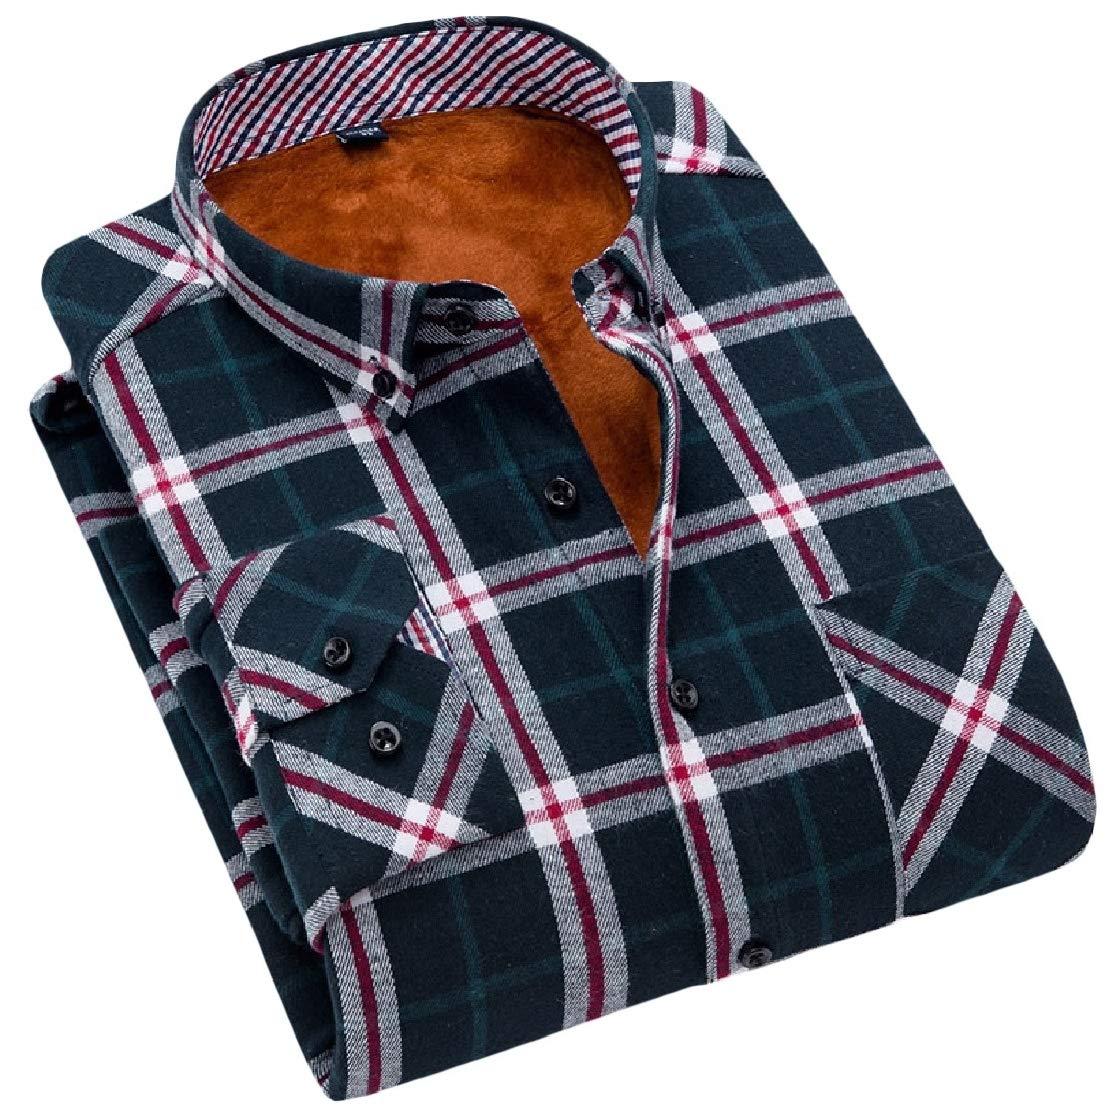 YUNY Men Fall Weinter Fit Thick Velvet Lapel Warm Plaid Work Flannel Shirt AS6 M